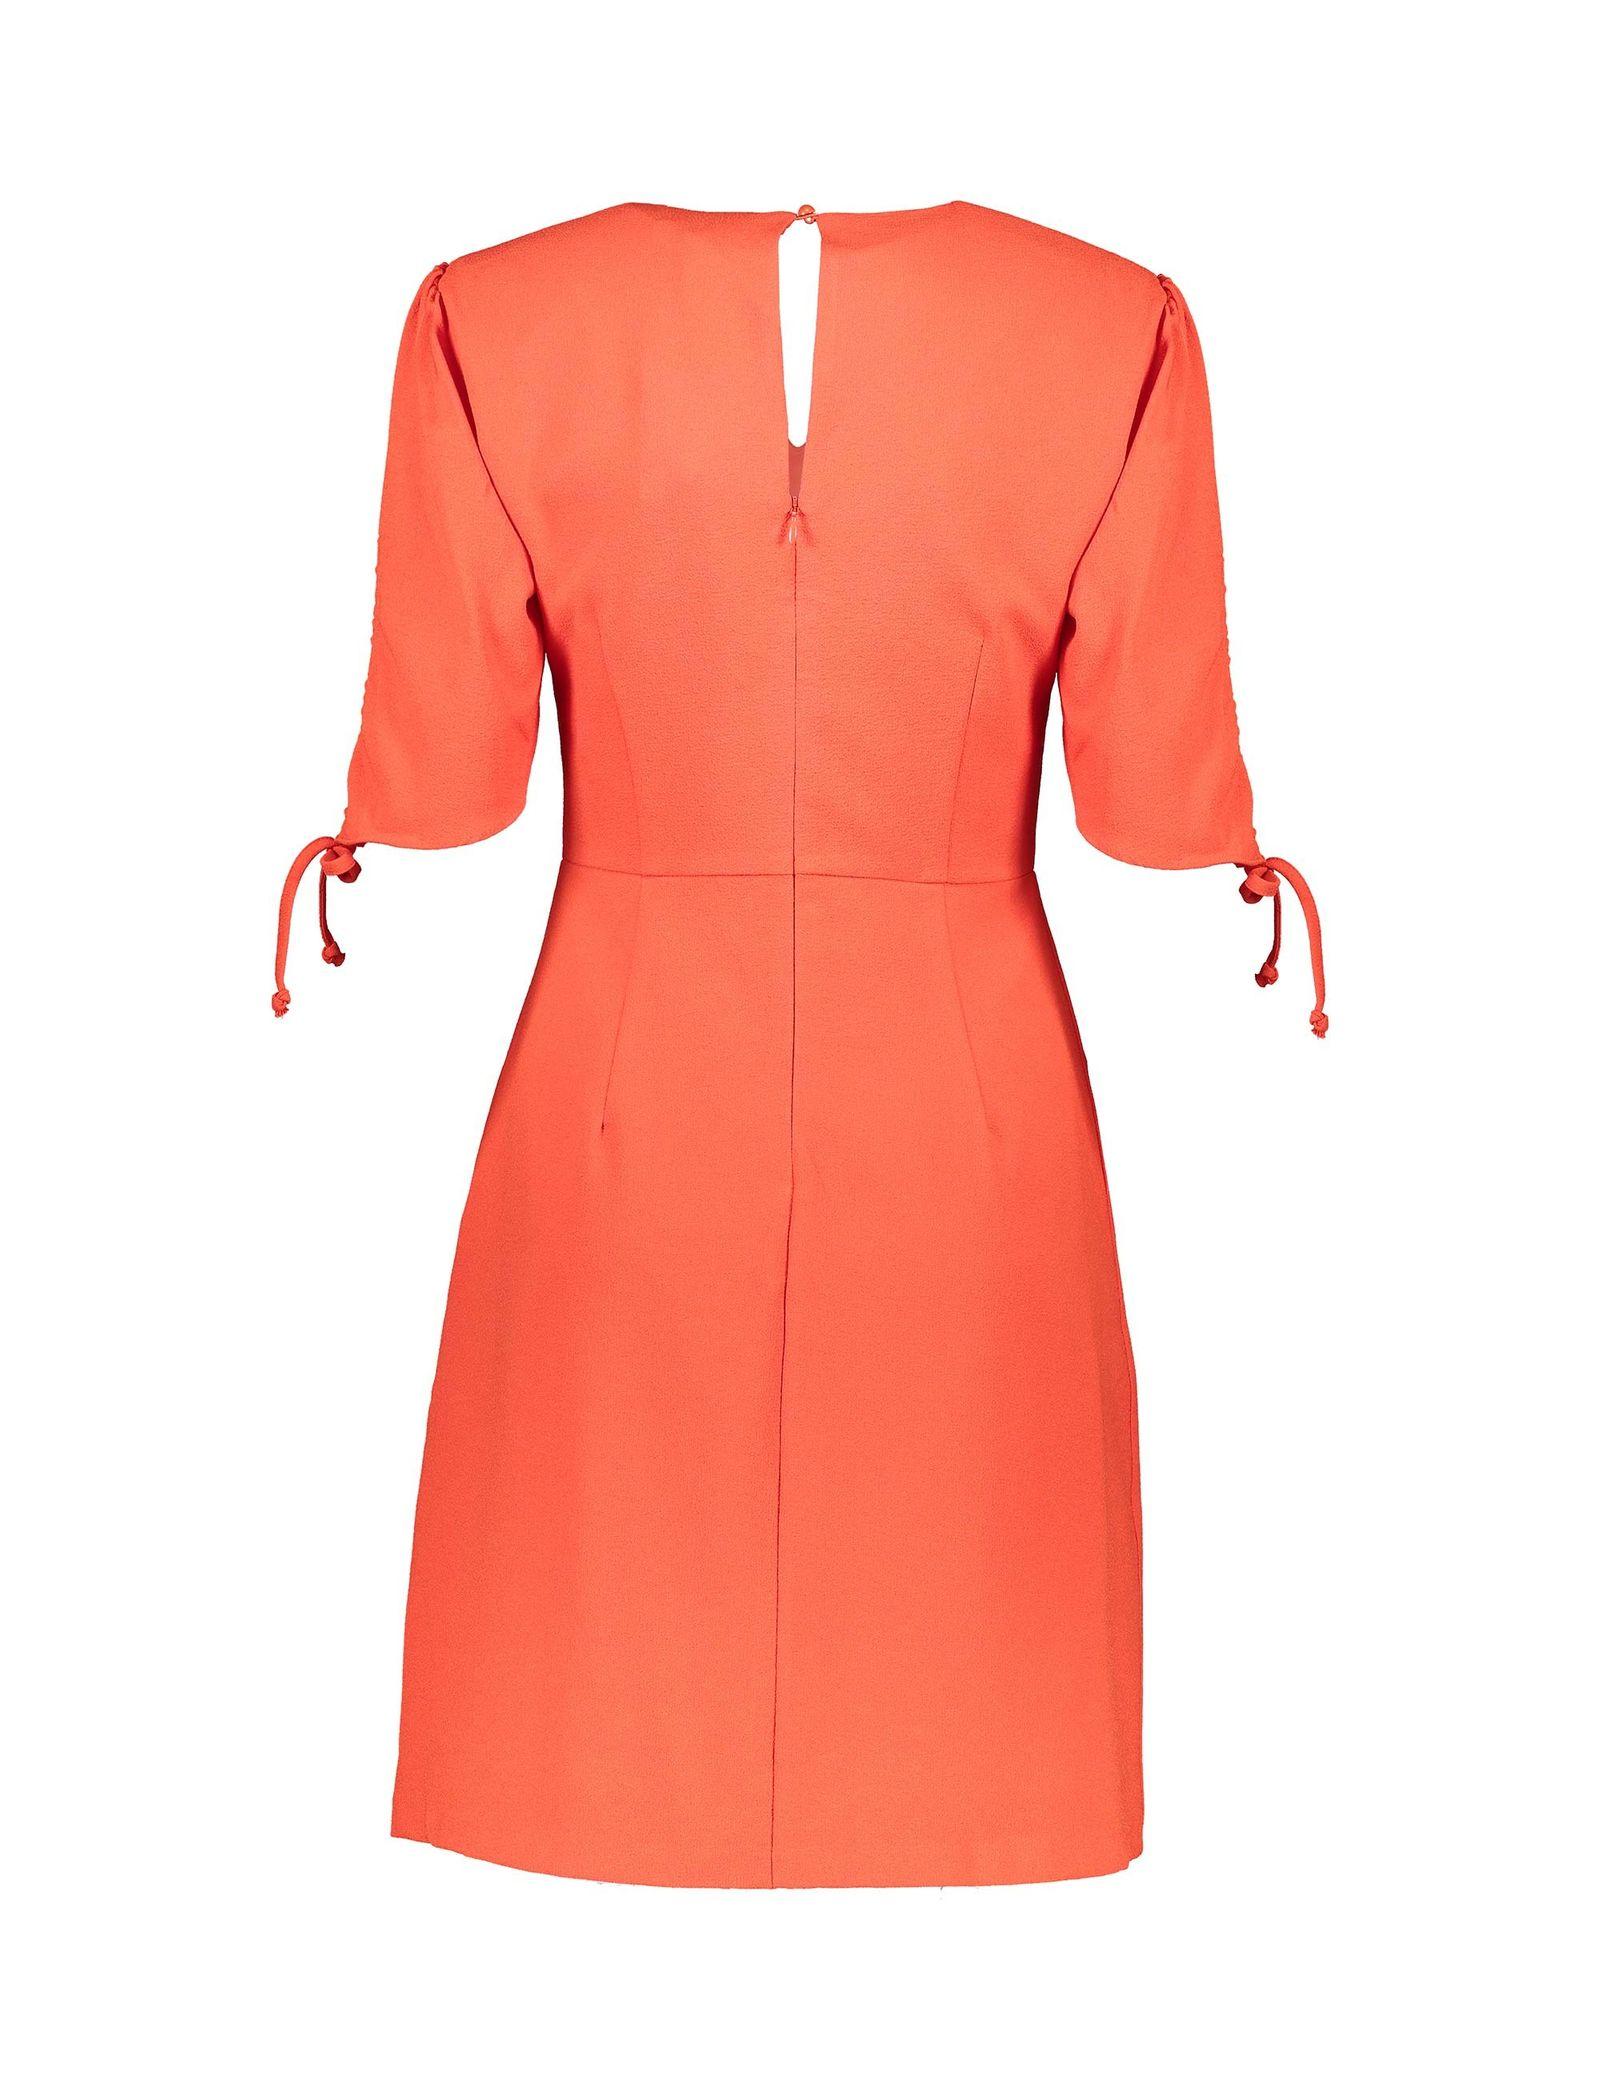 پیراهن کوتاه زنانه - کوتون - قرمز - 2